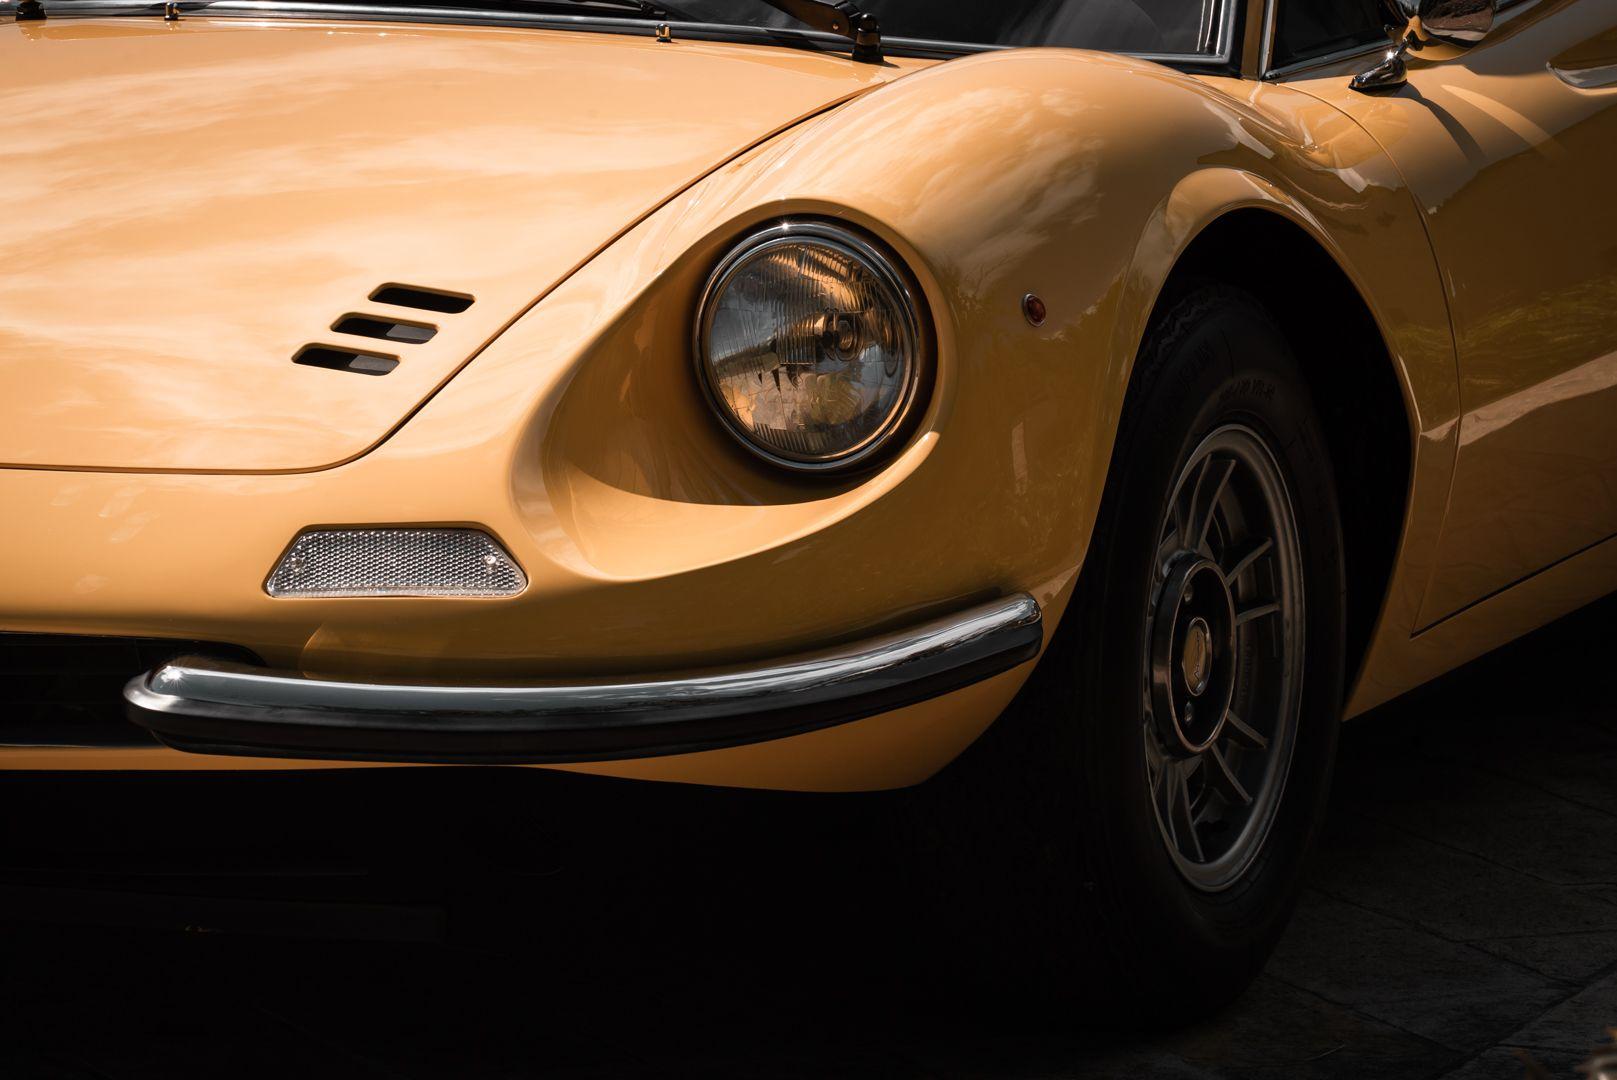 1972 Ferrari Dino 246 GT 70561